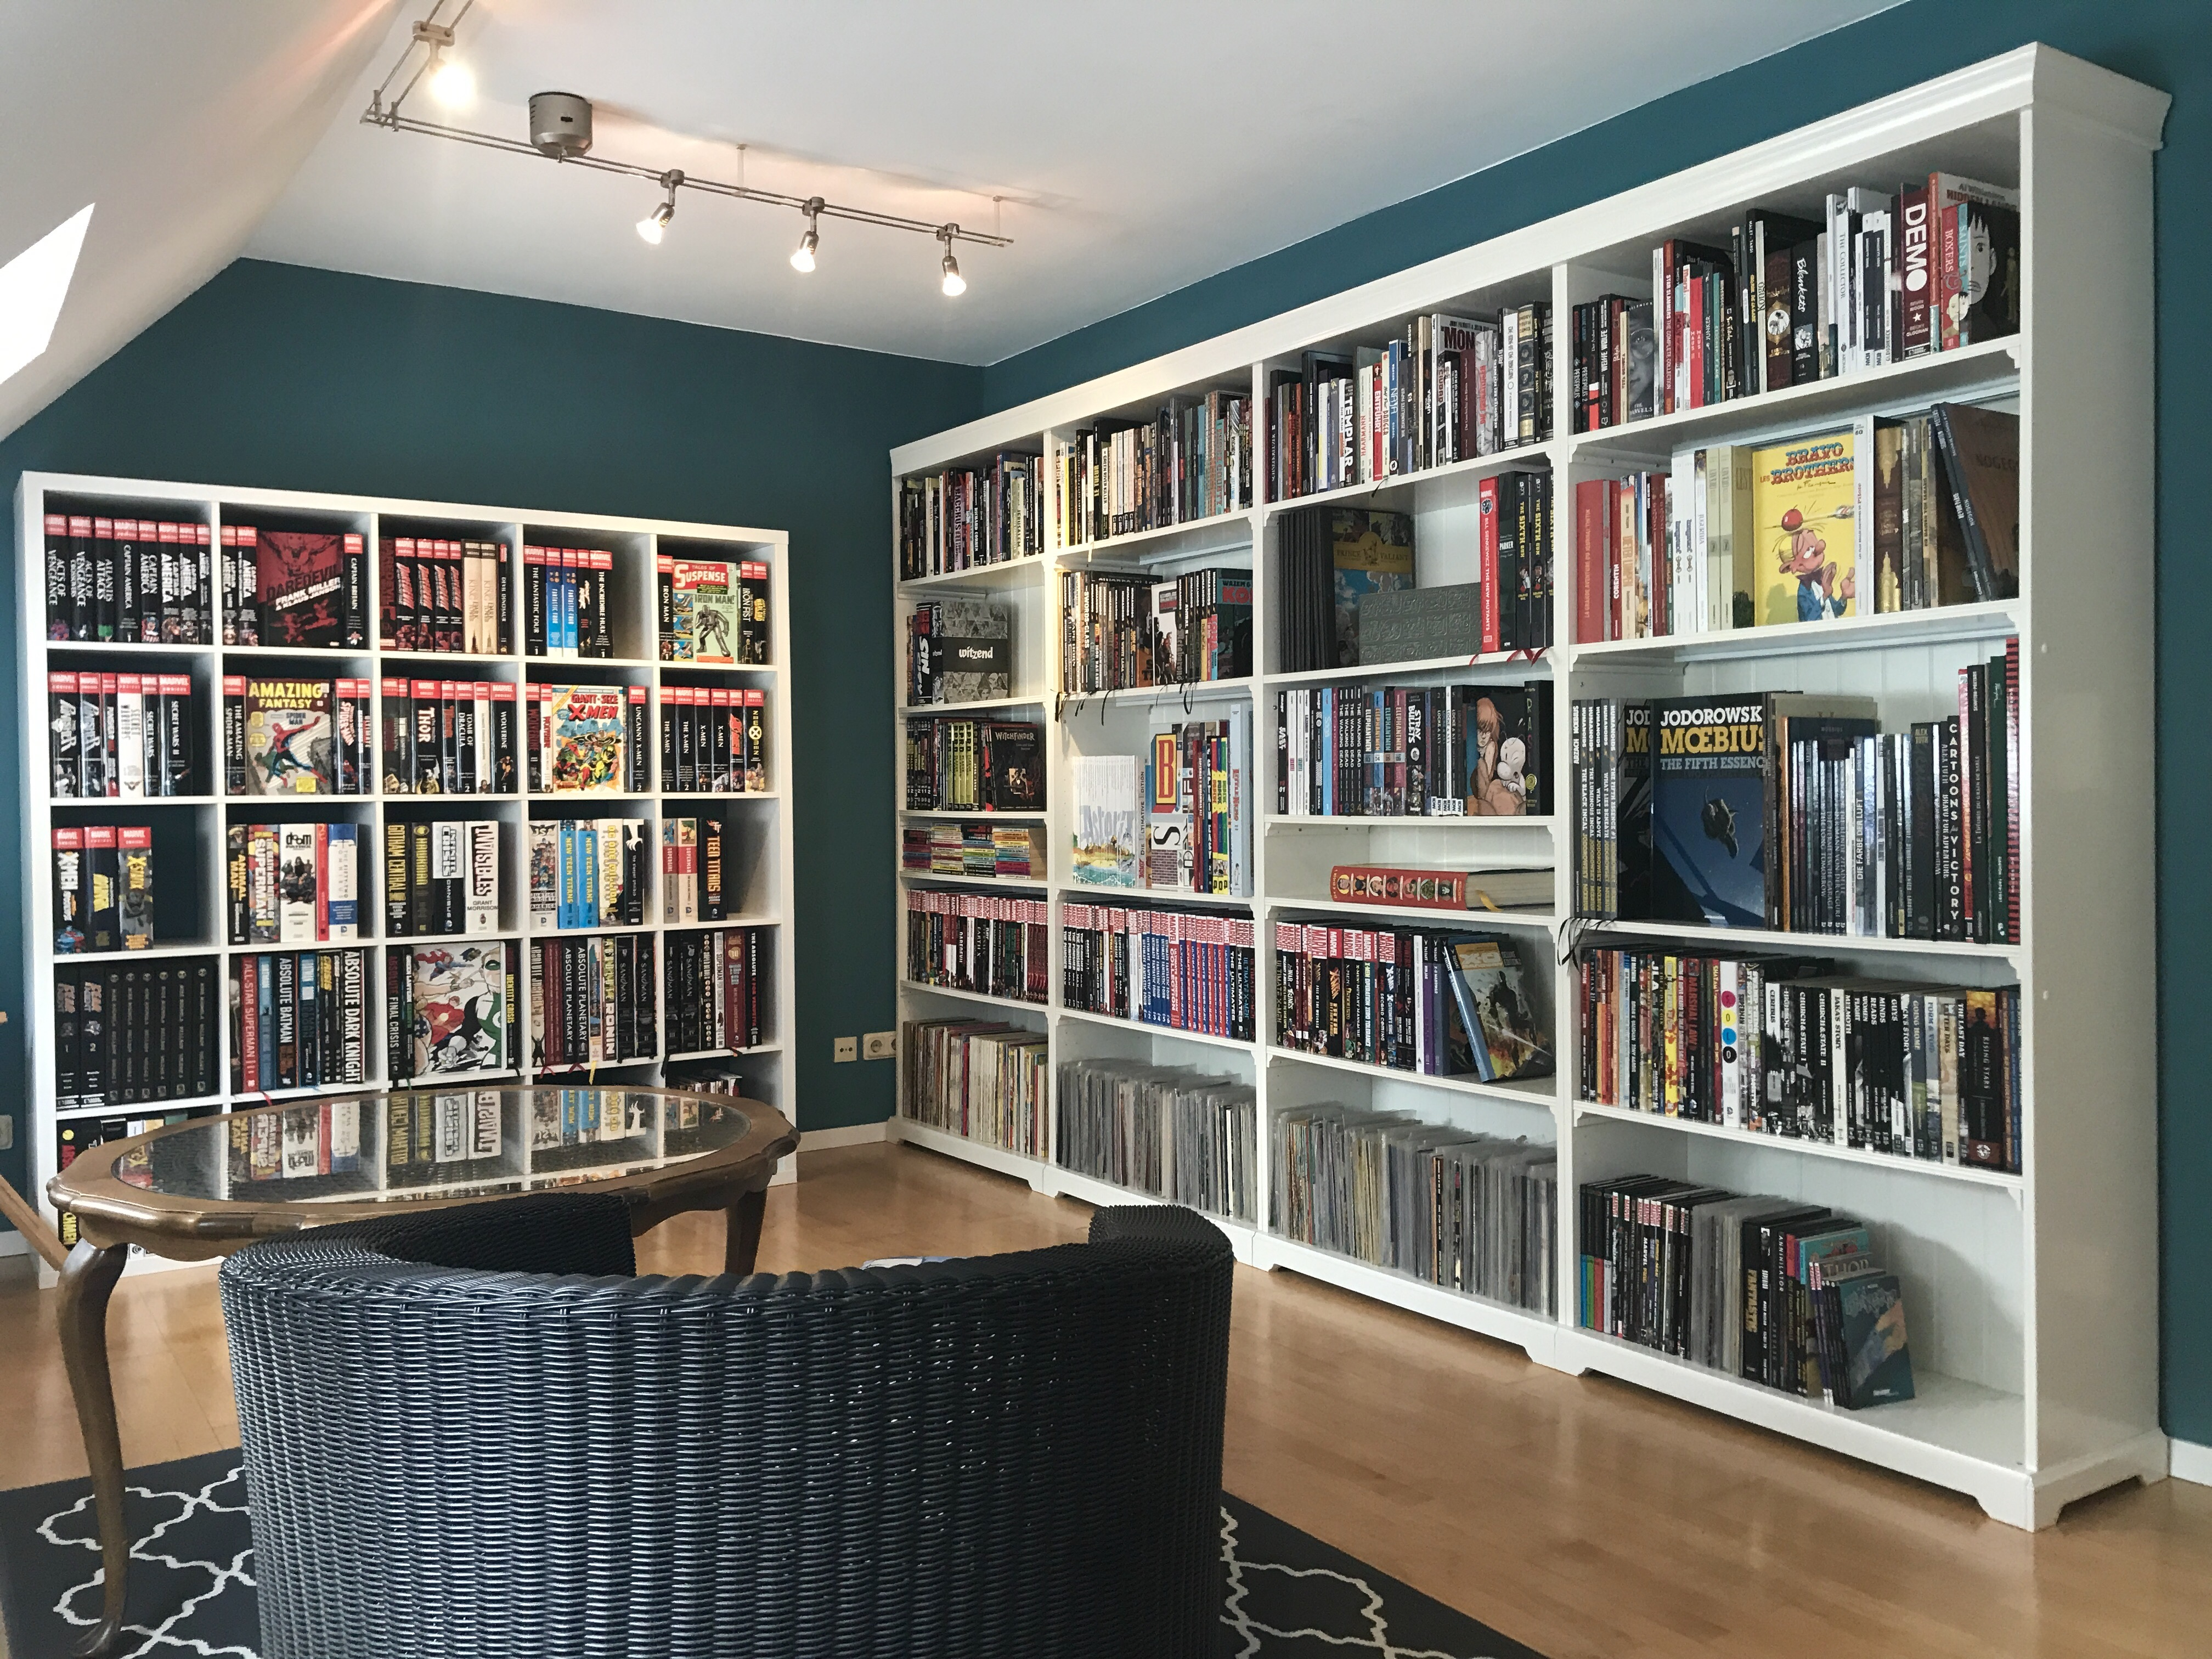 Bottom shelf the